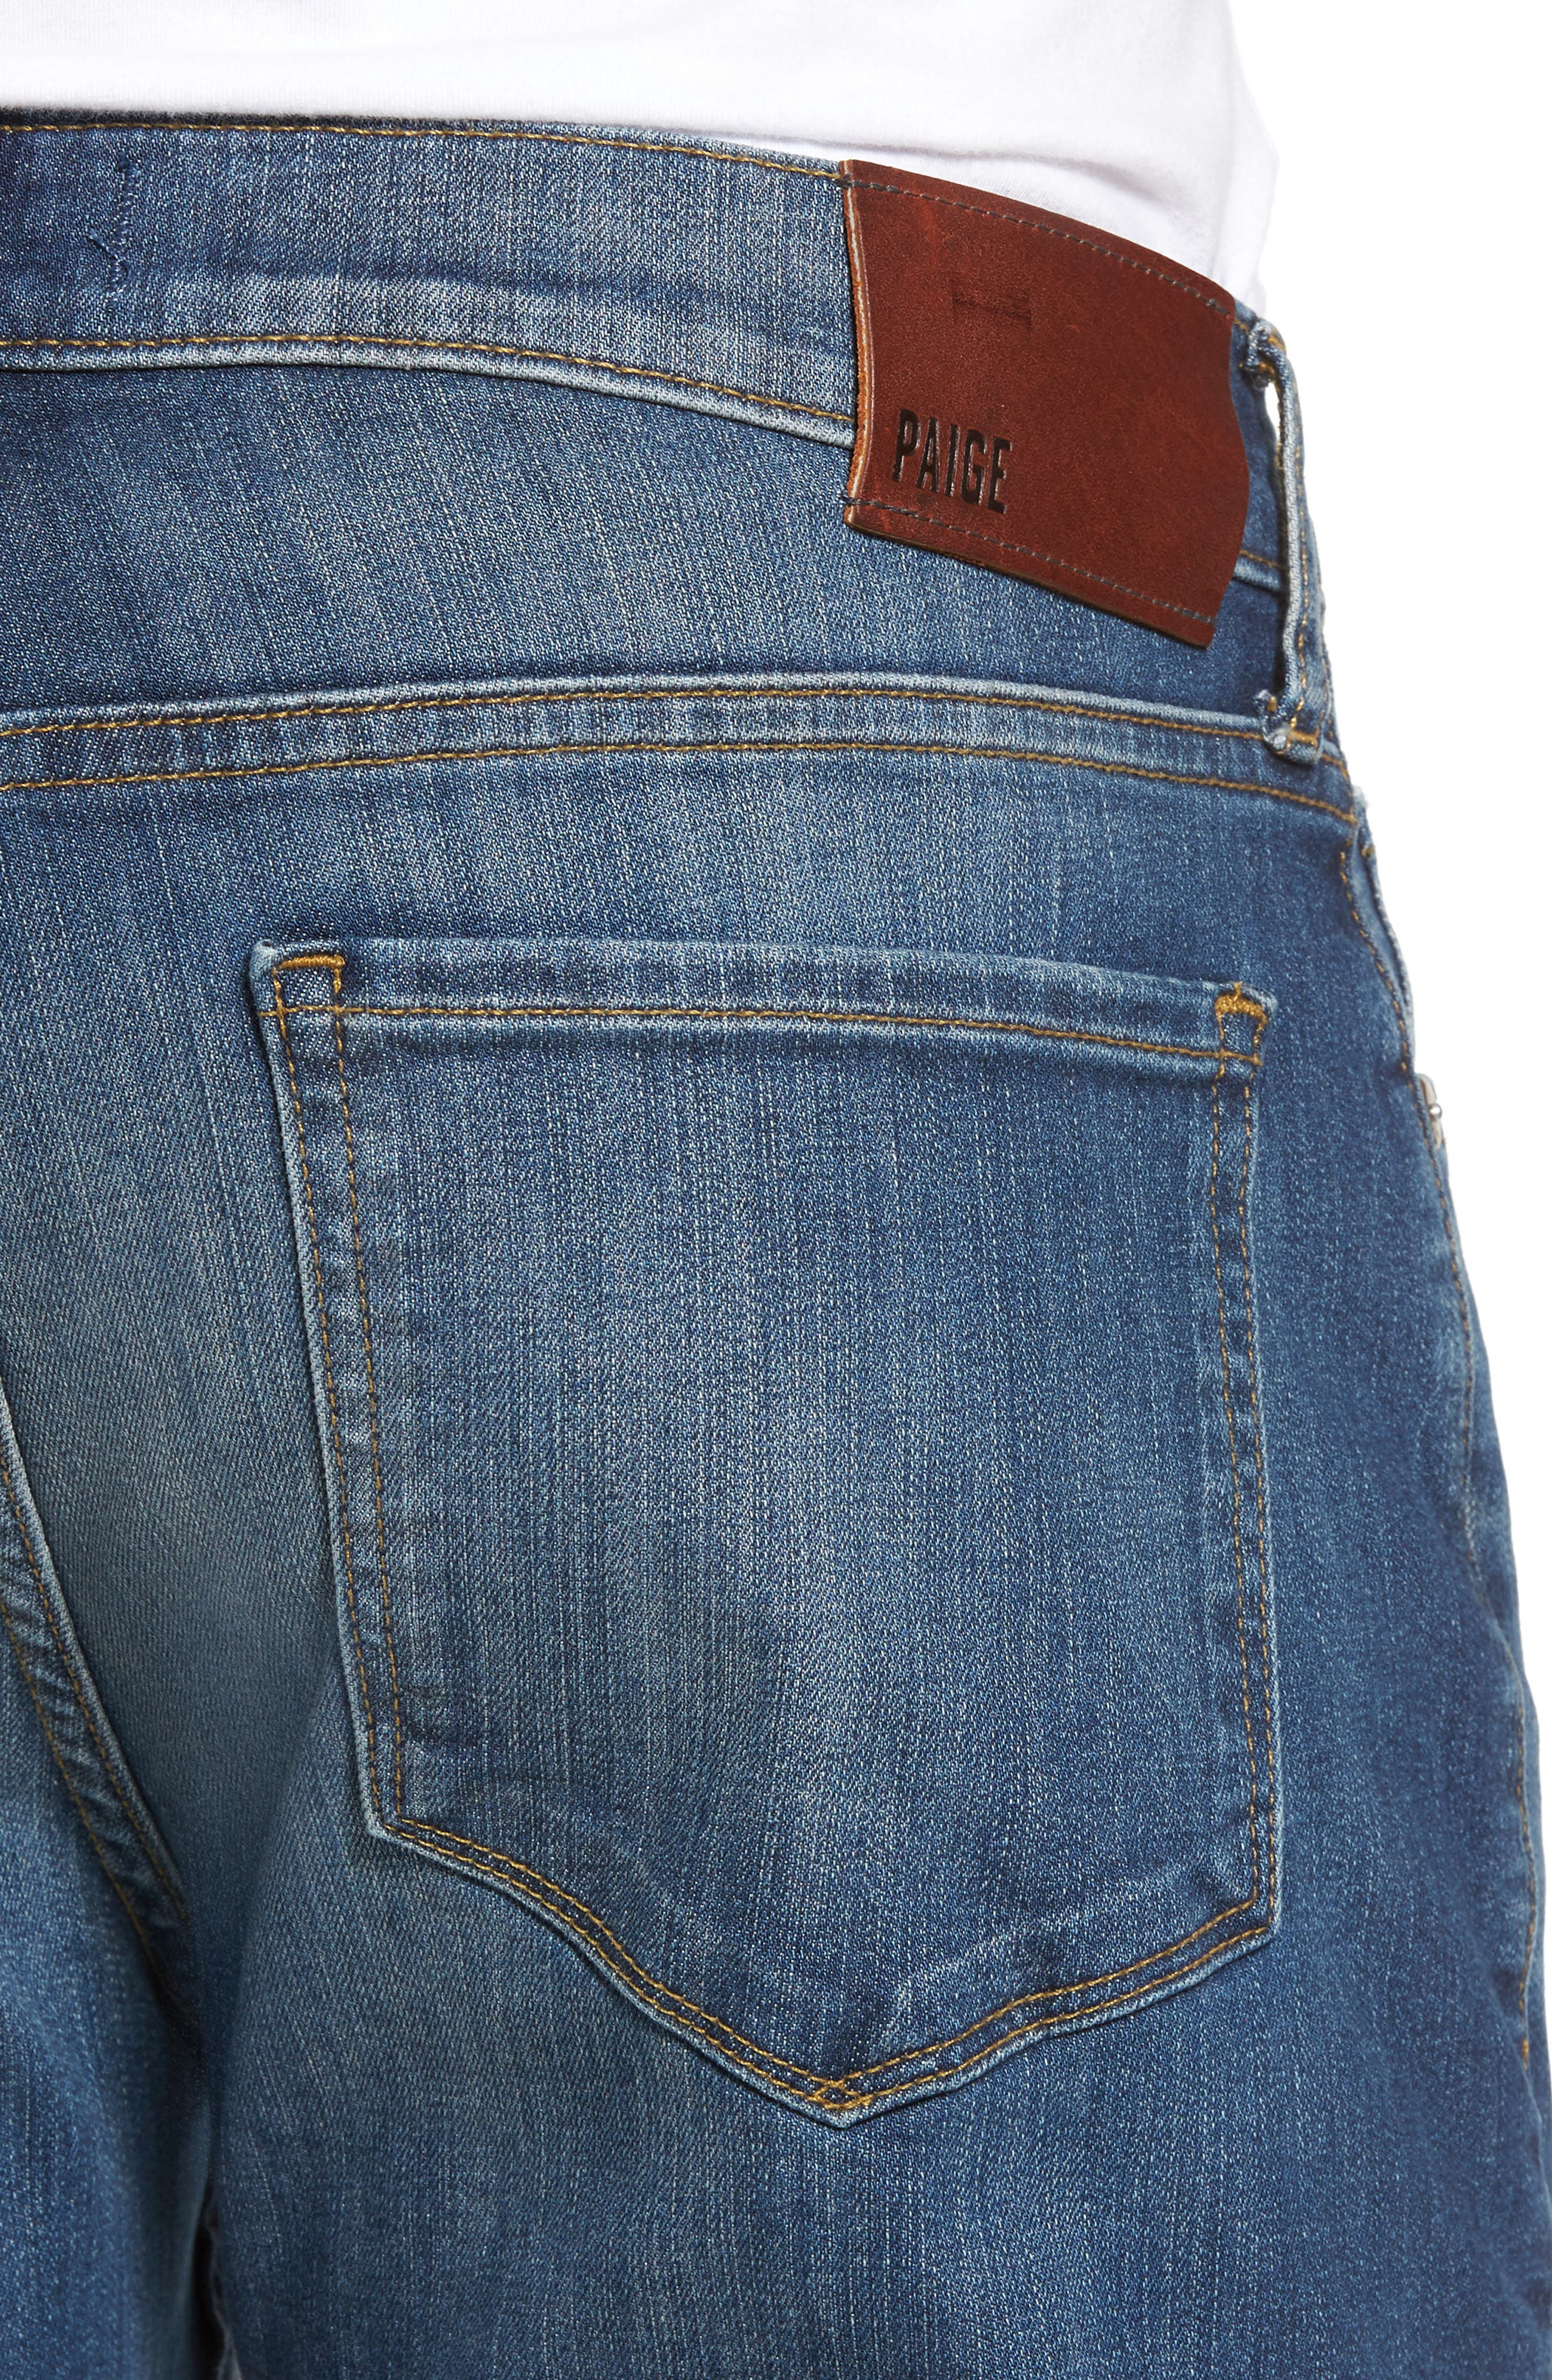 Legacy - Normandie Straight Leg Jeans,                             Alternate thumbnail 4, color,                             Harlan